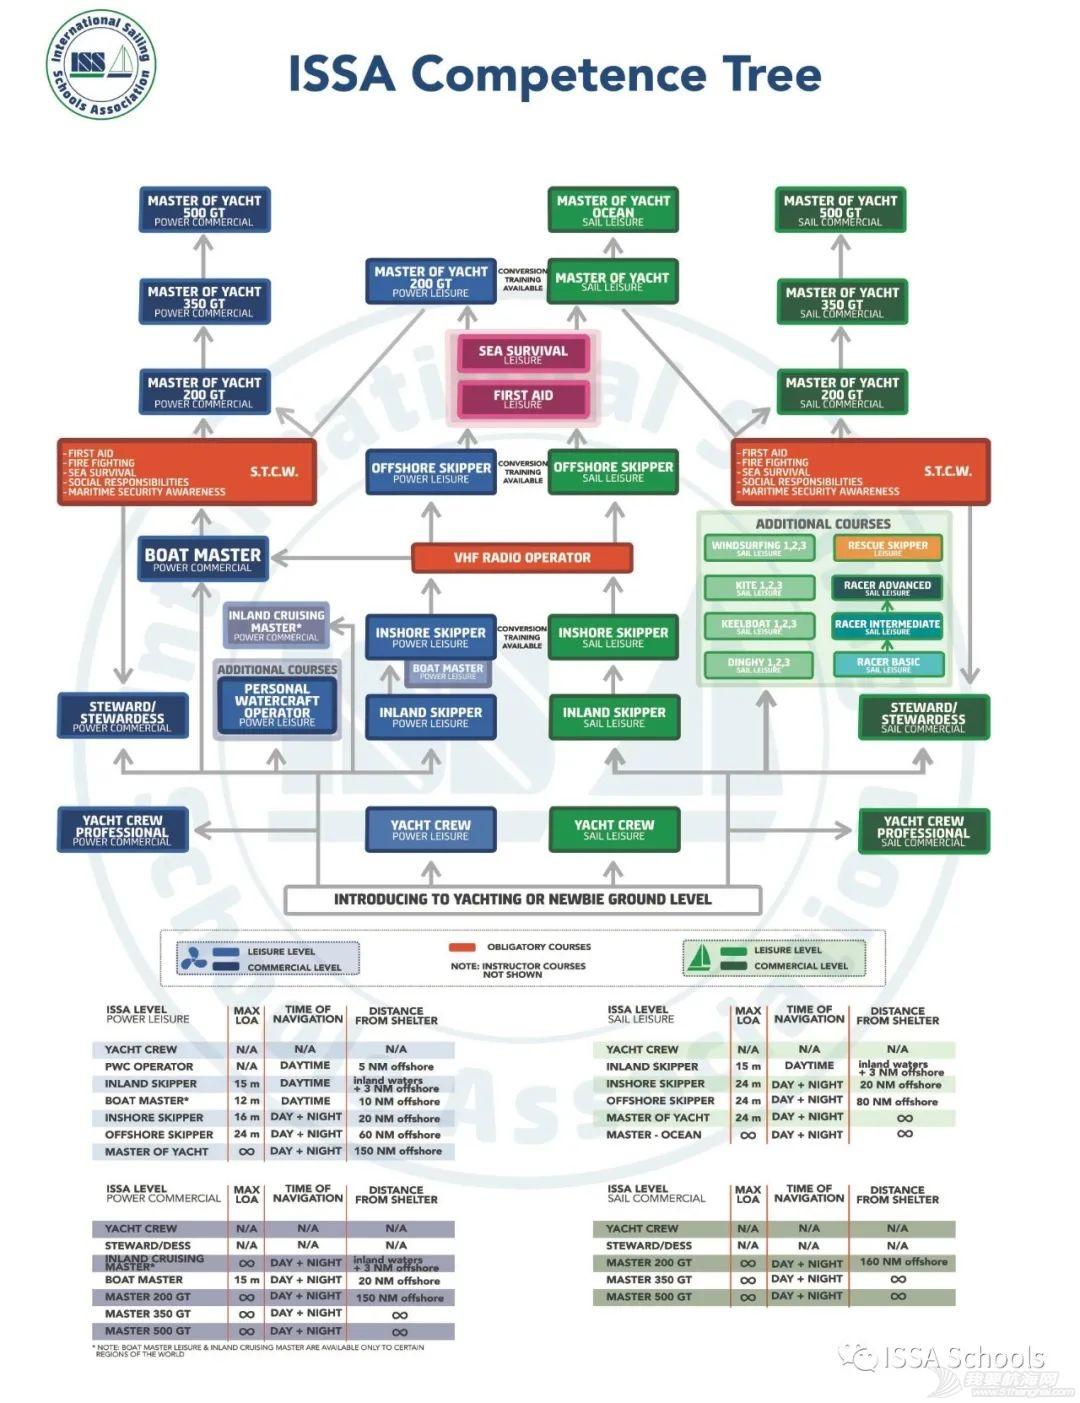 ISSA证书系统介绍